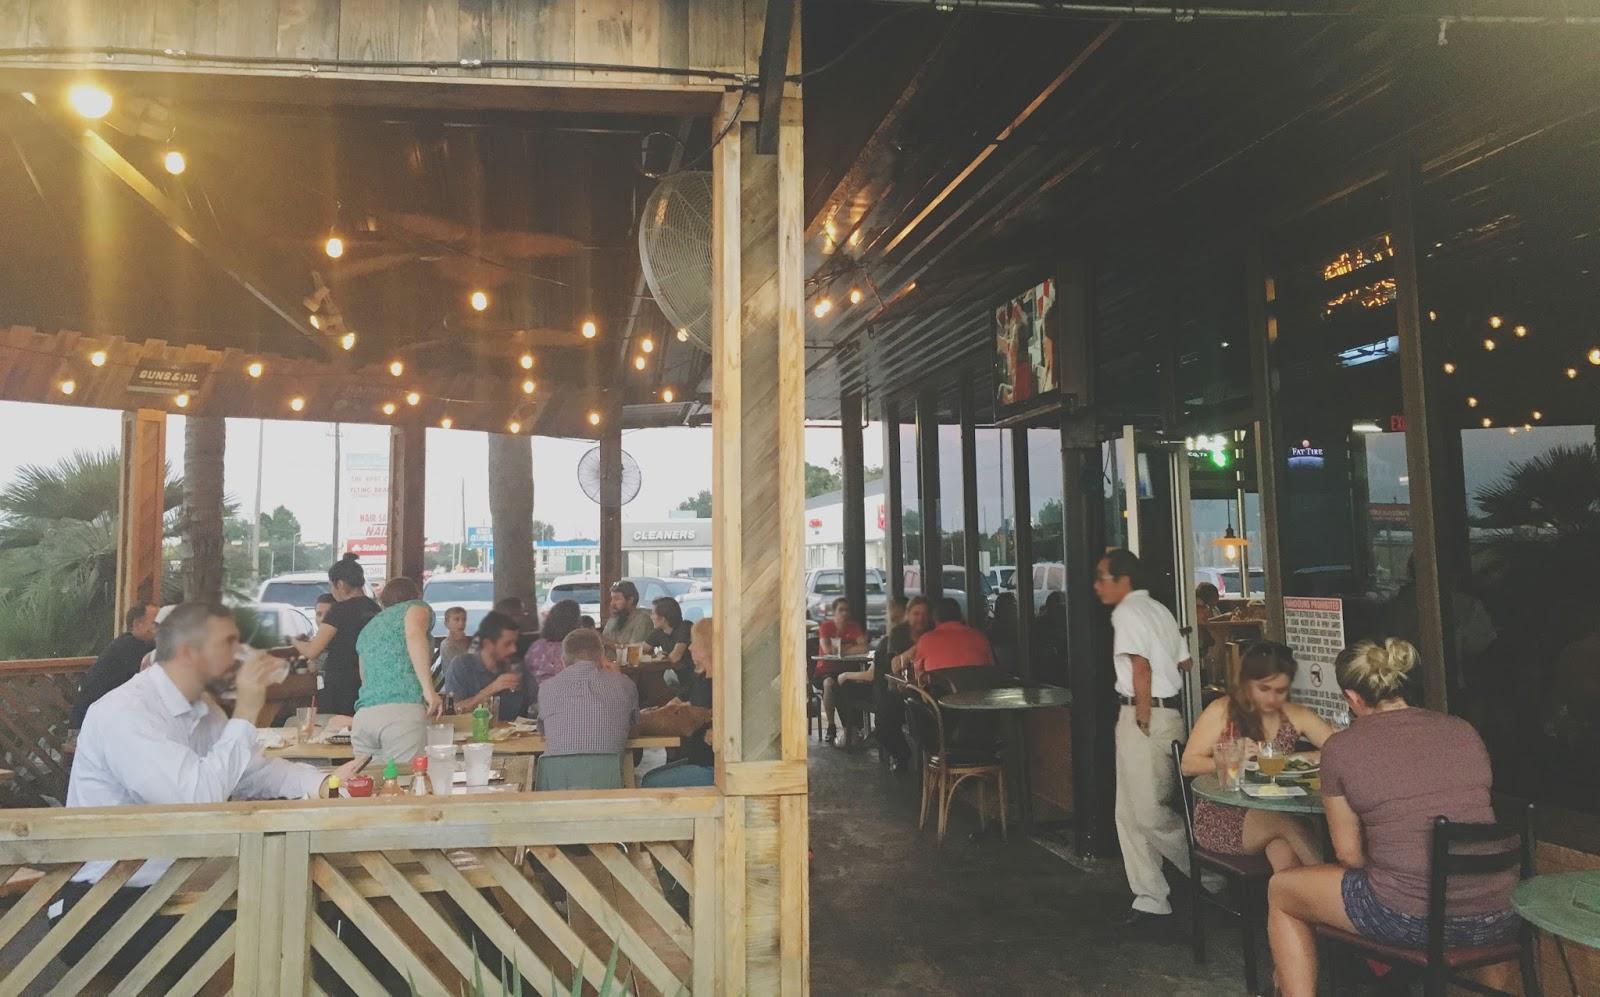 Hughie's - A restaurant/bar in Houston, Texas